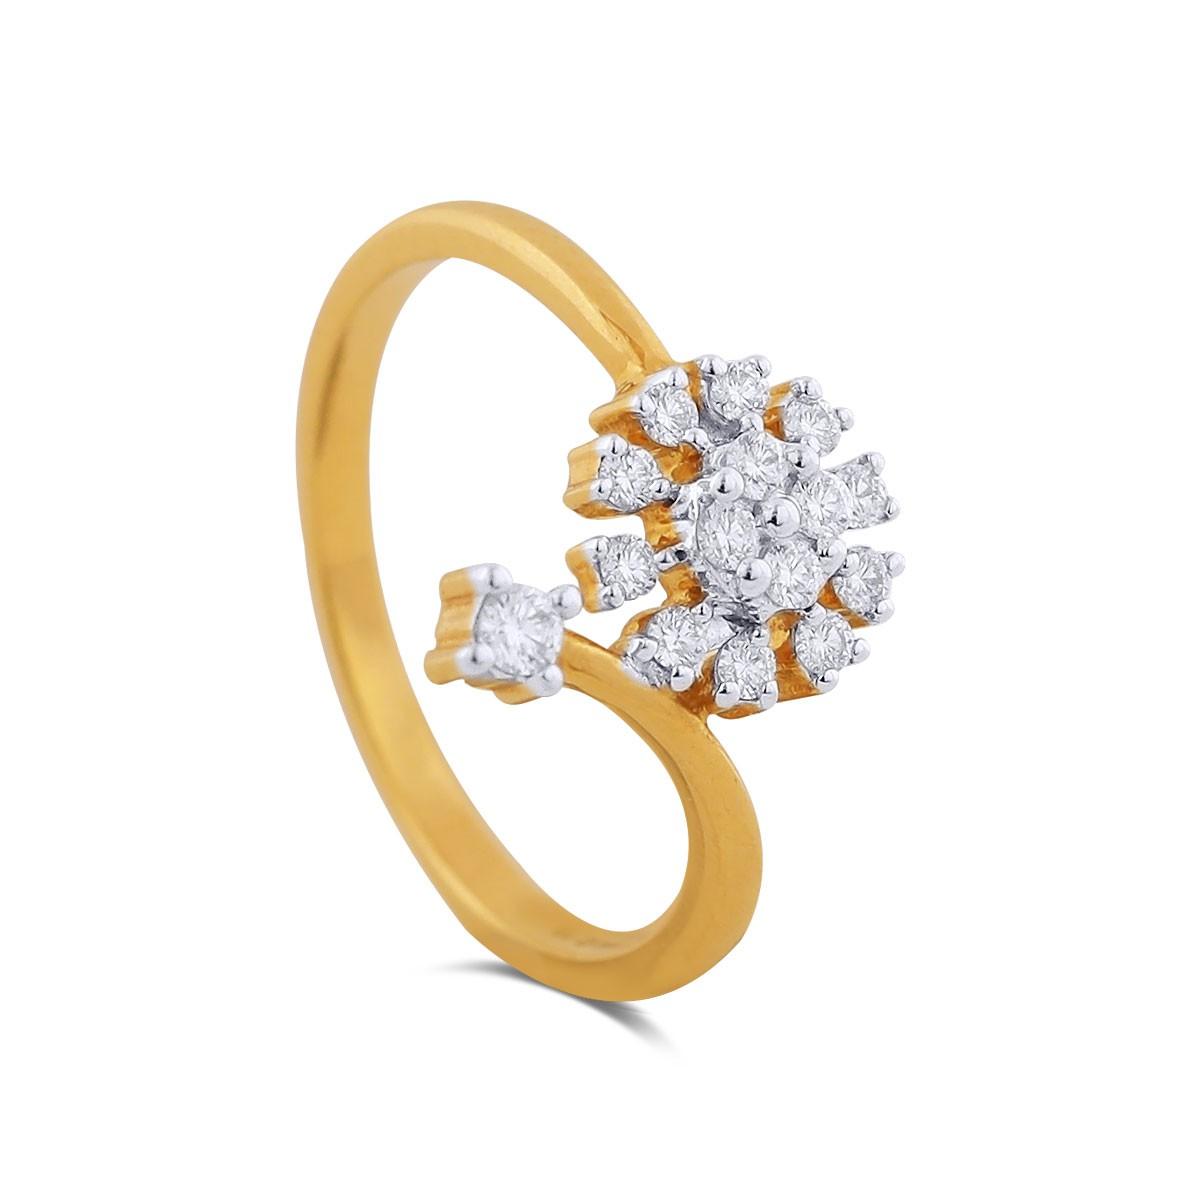 Deanna Yellow Gold Diamond Ring